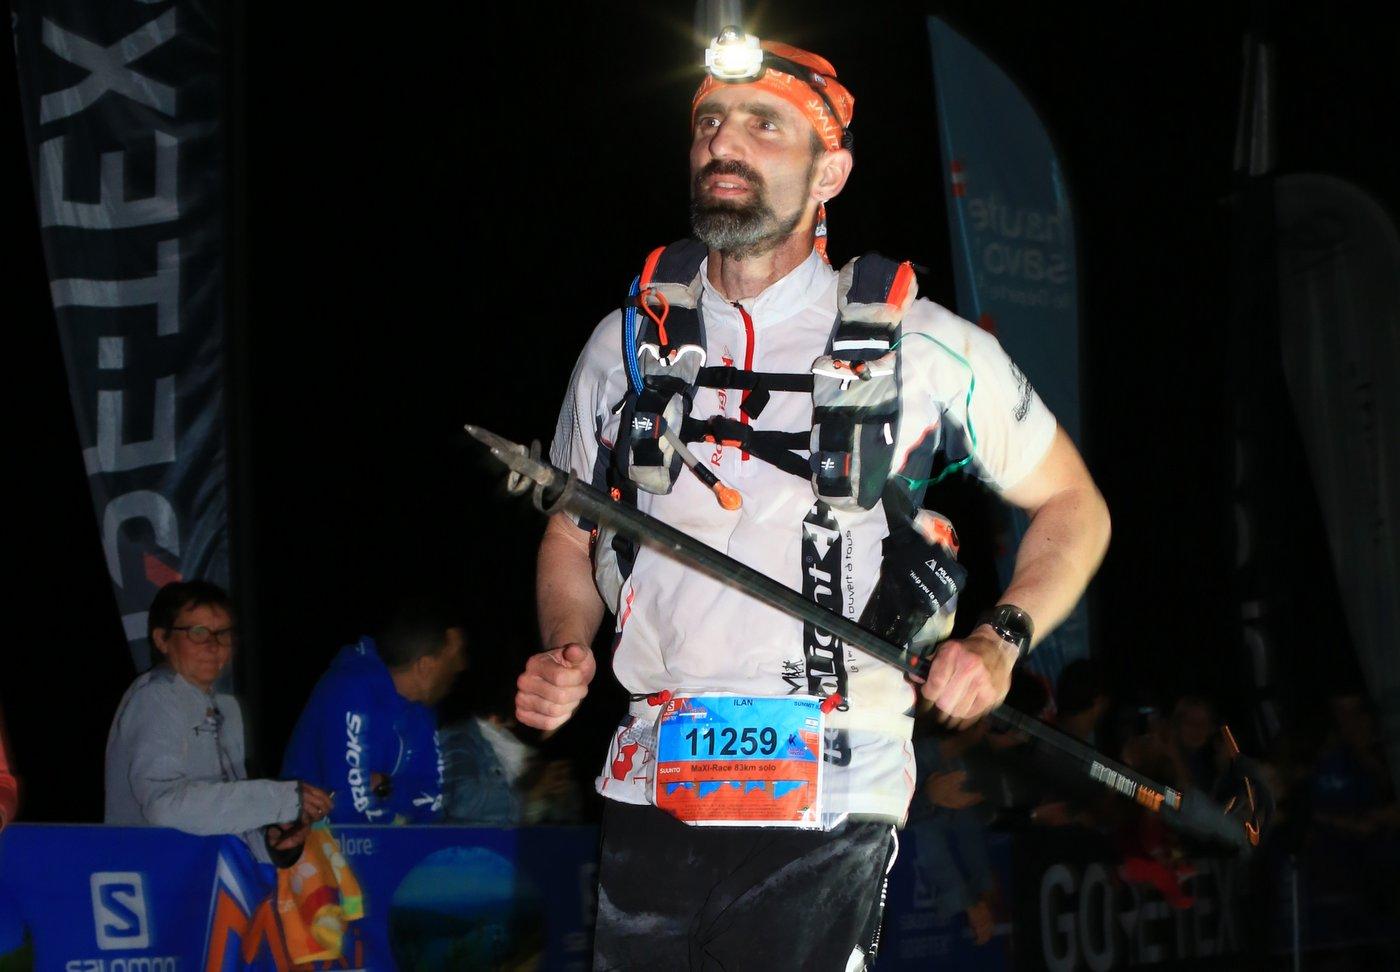 ultra marathom